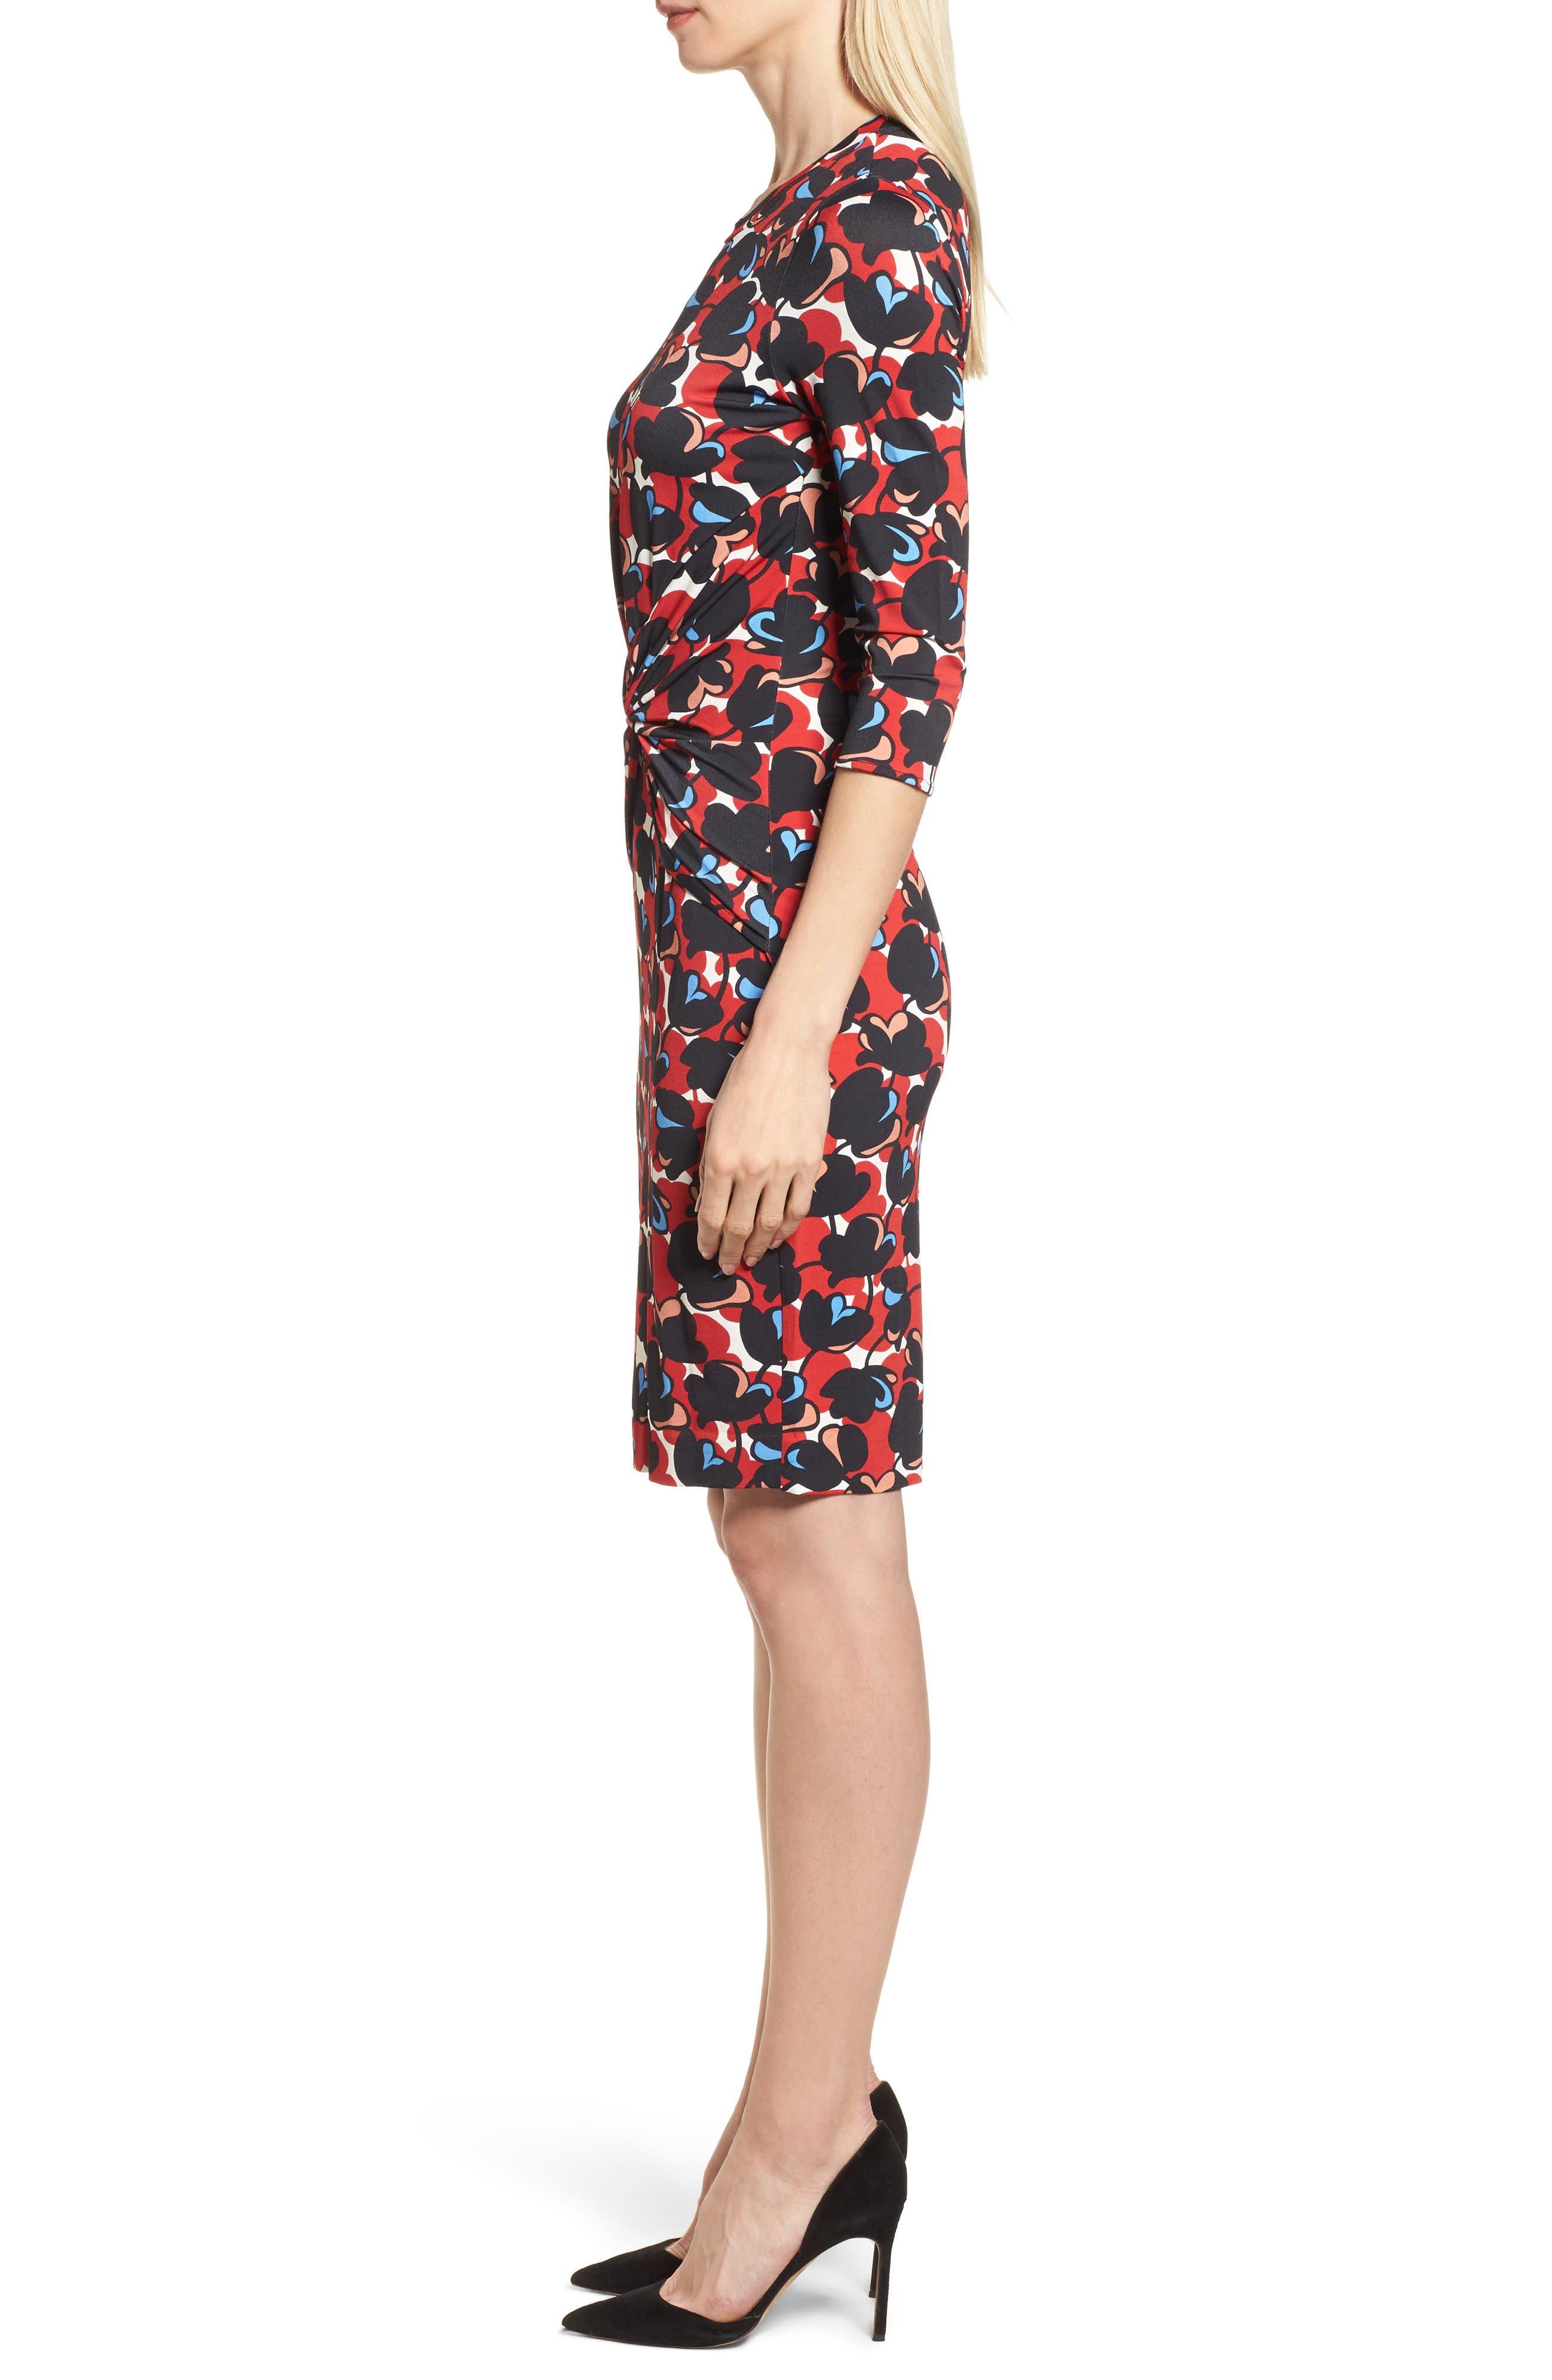 Eleika Print Jersey Sheath Dress,                             Alternate thumbnail 3, color,                             Multicolor Flower Print